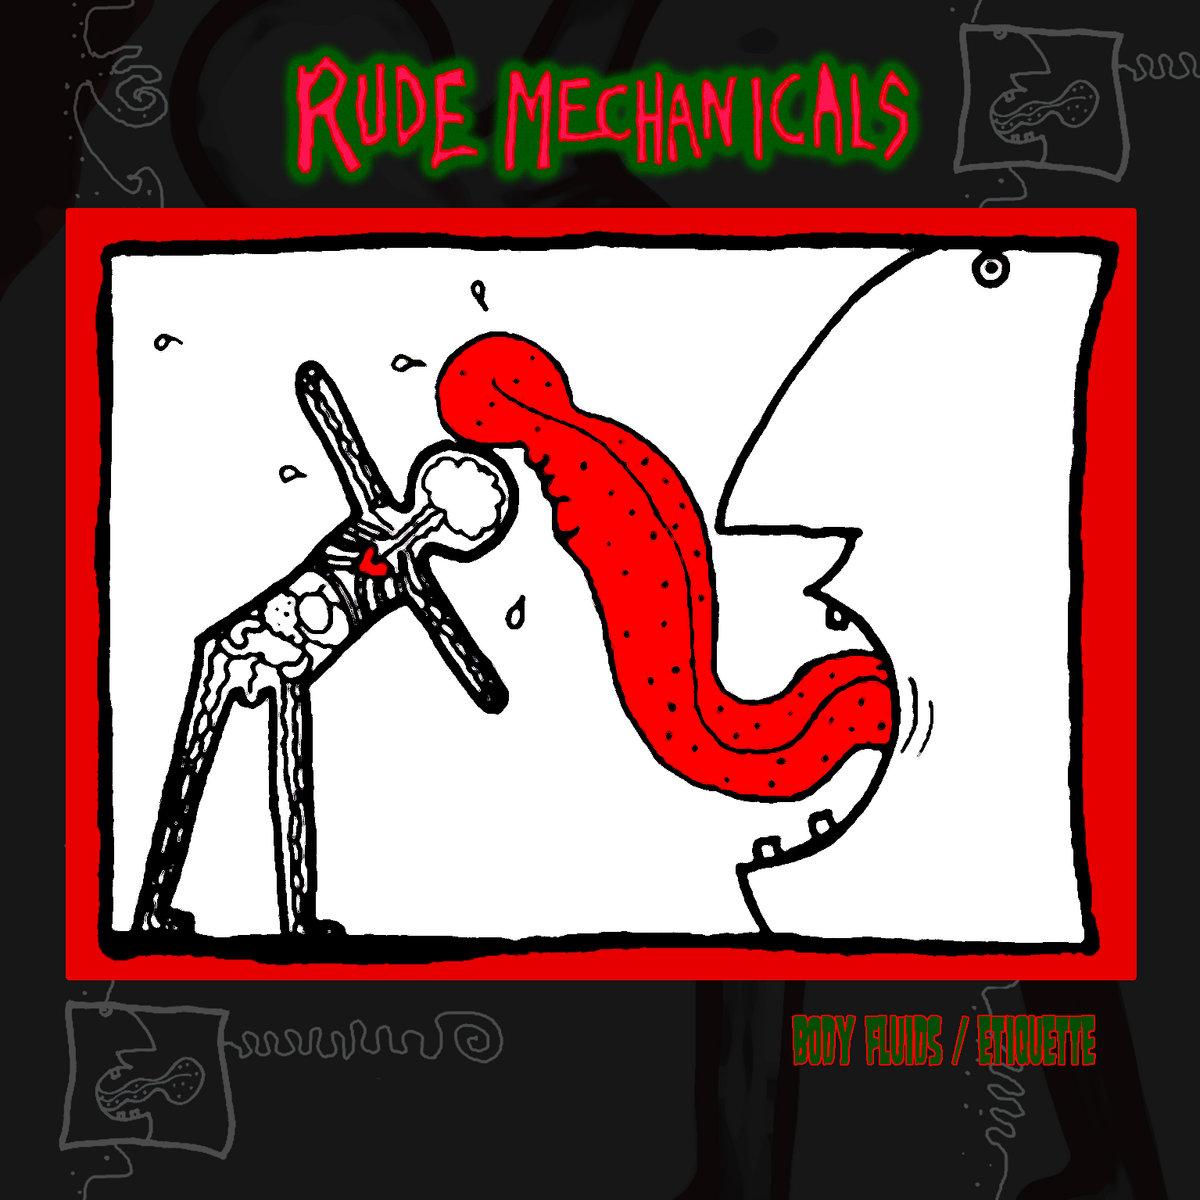 RUDE MECHANICALS Etiquette by Miss Roberts & Rude Mechanicals